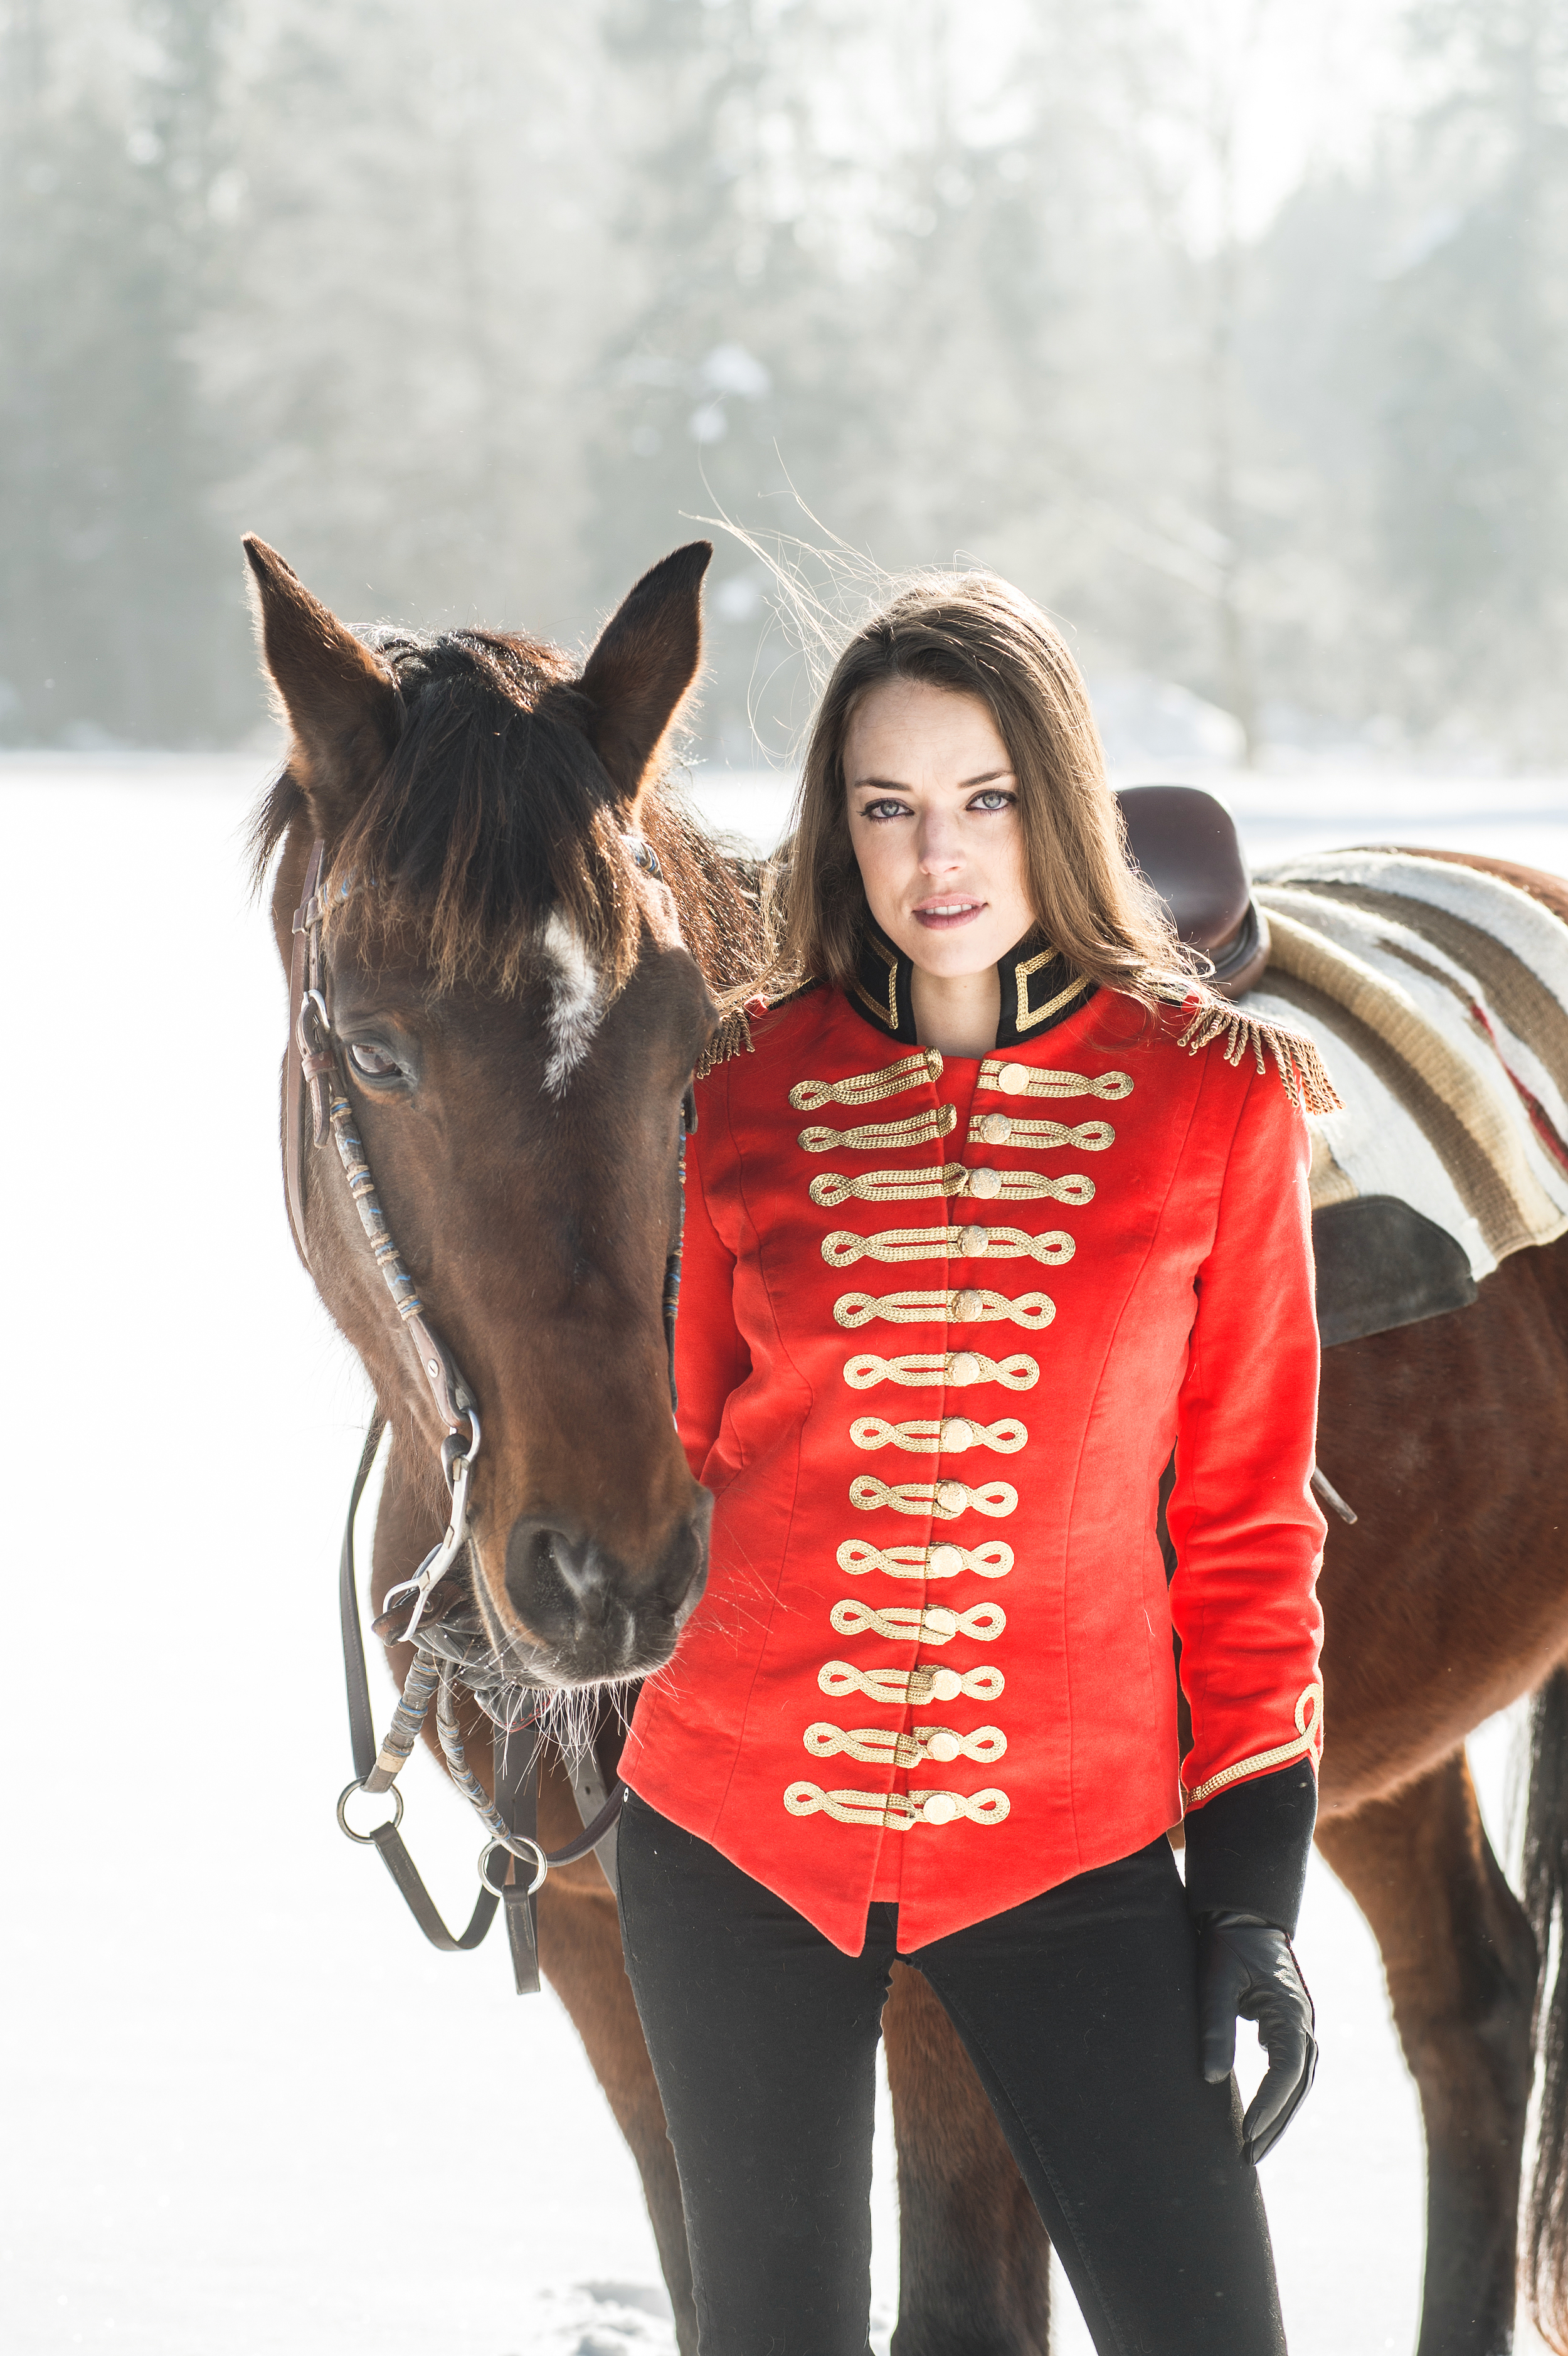 Isabel horse standing red jacket no hat.jpg